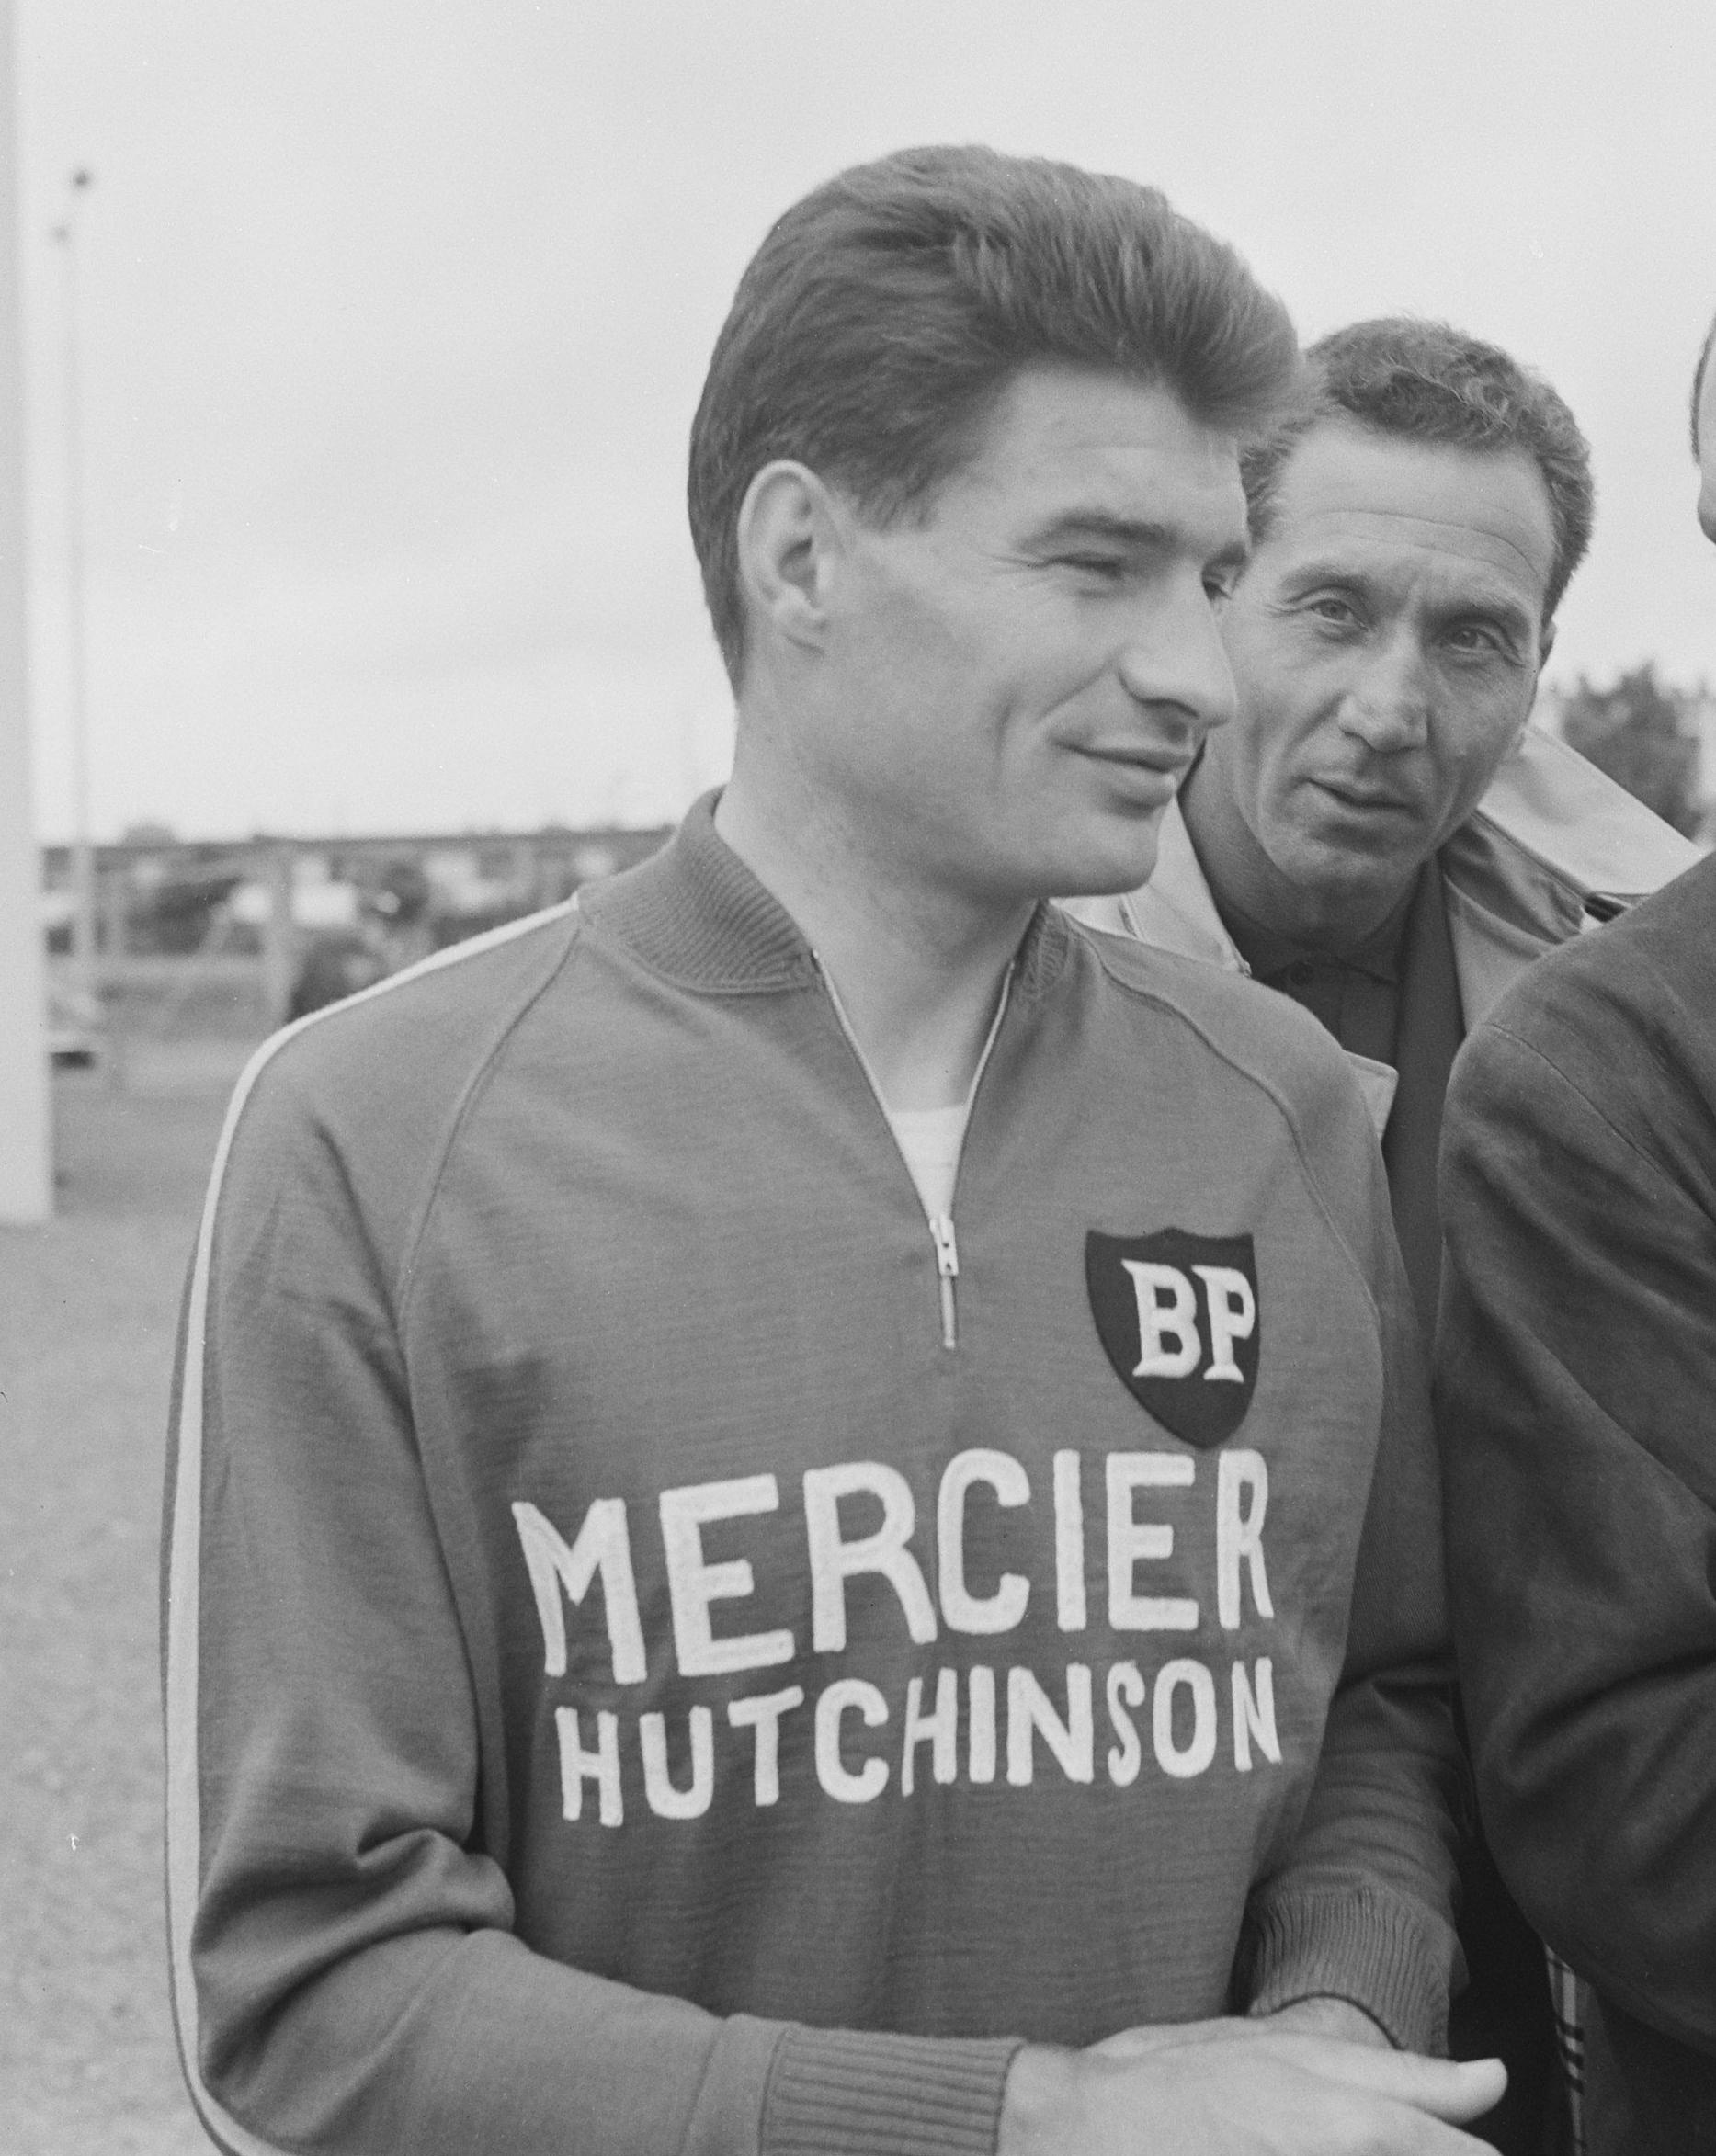 1964 MERCIER HUTCHINSON cycling Short Sleeve Jersey mens Cycling Jersey